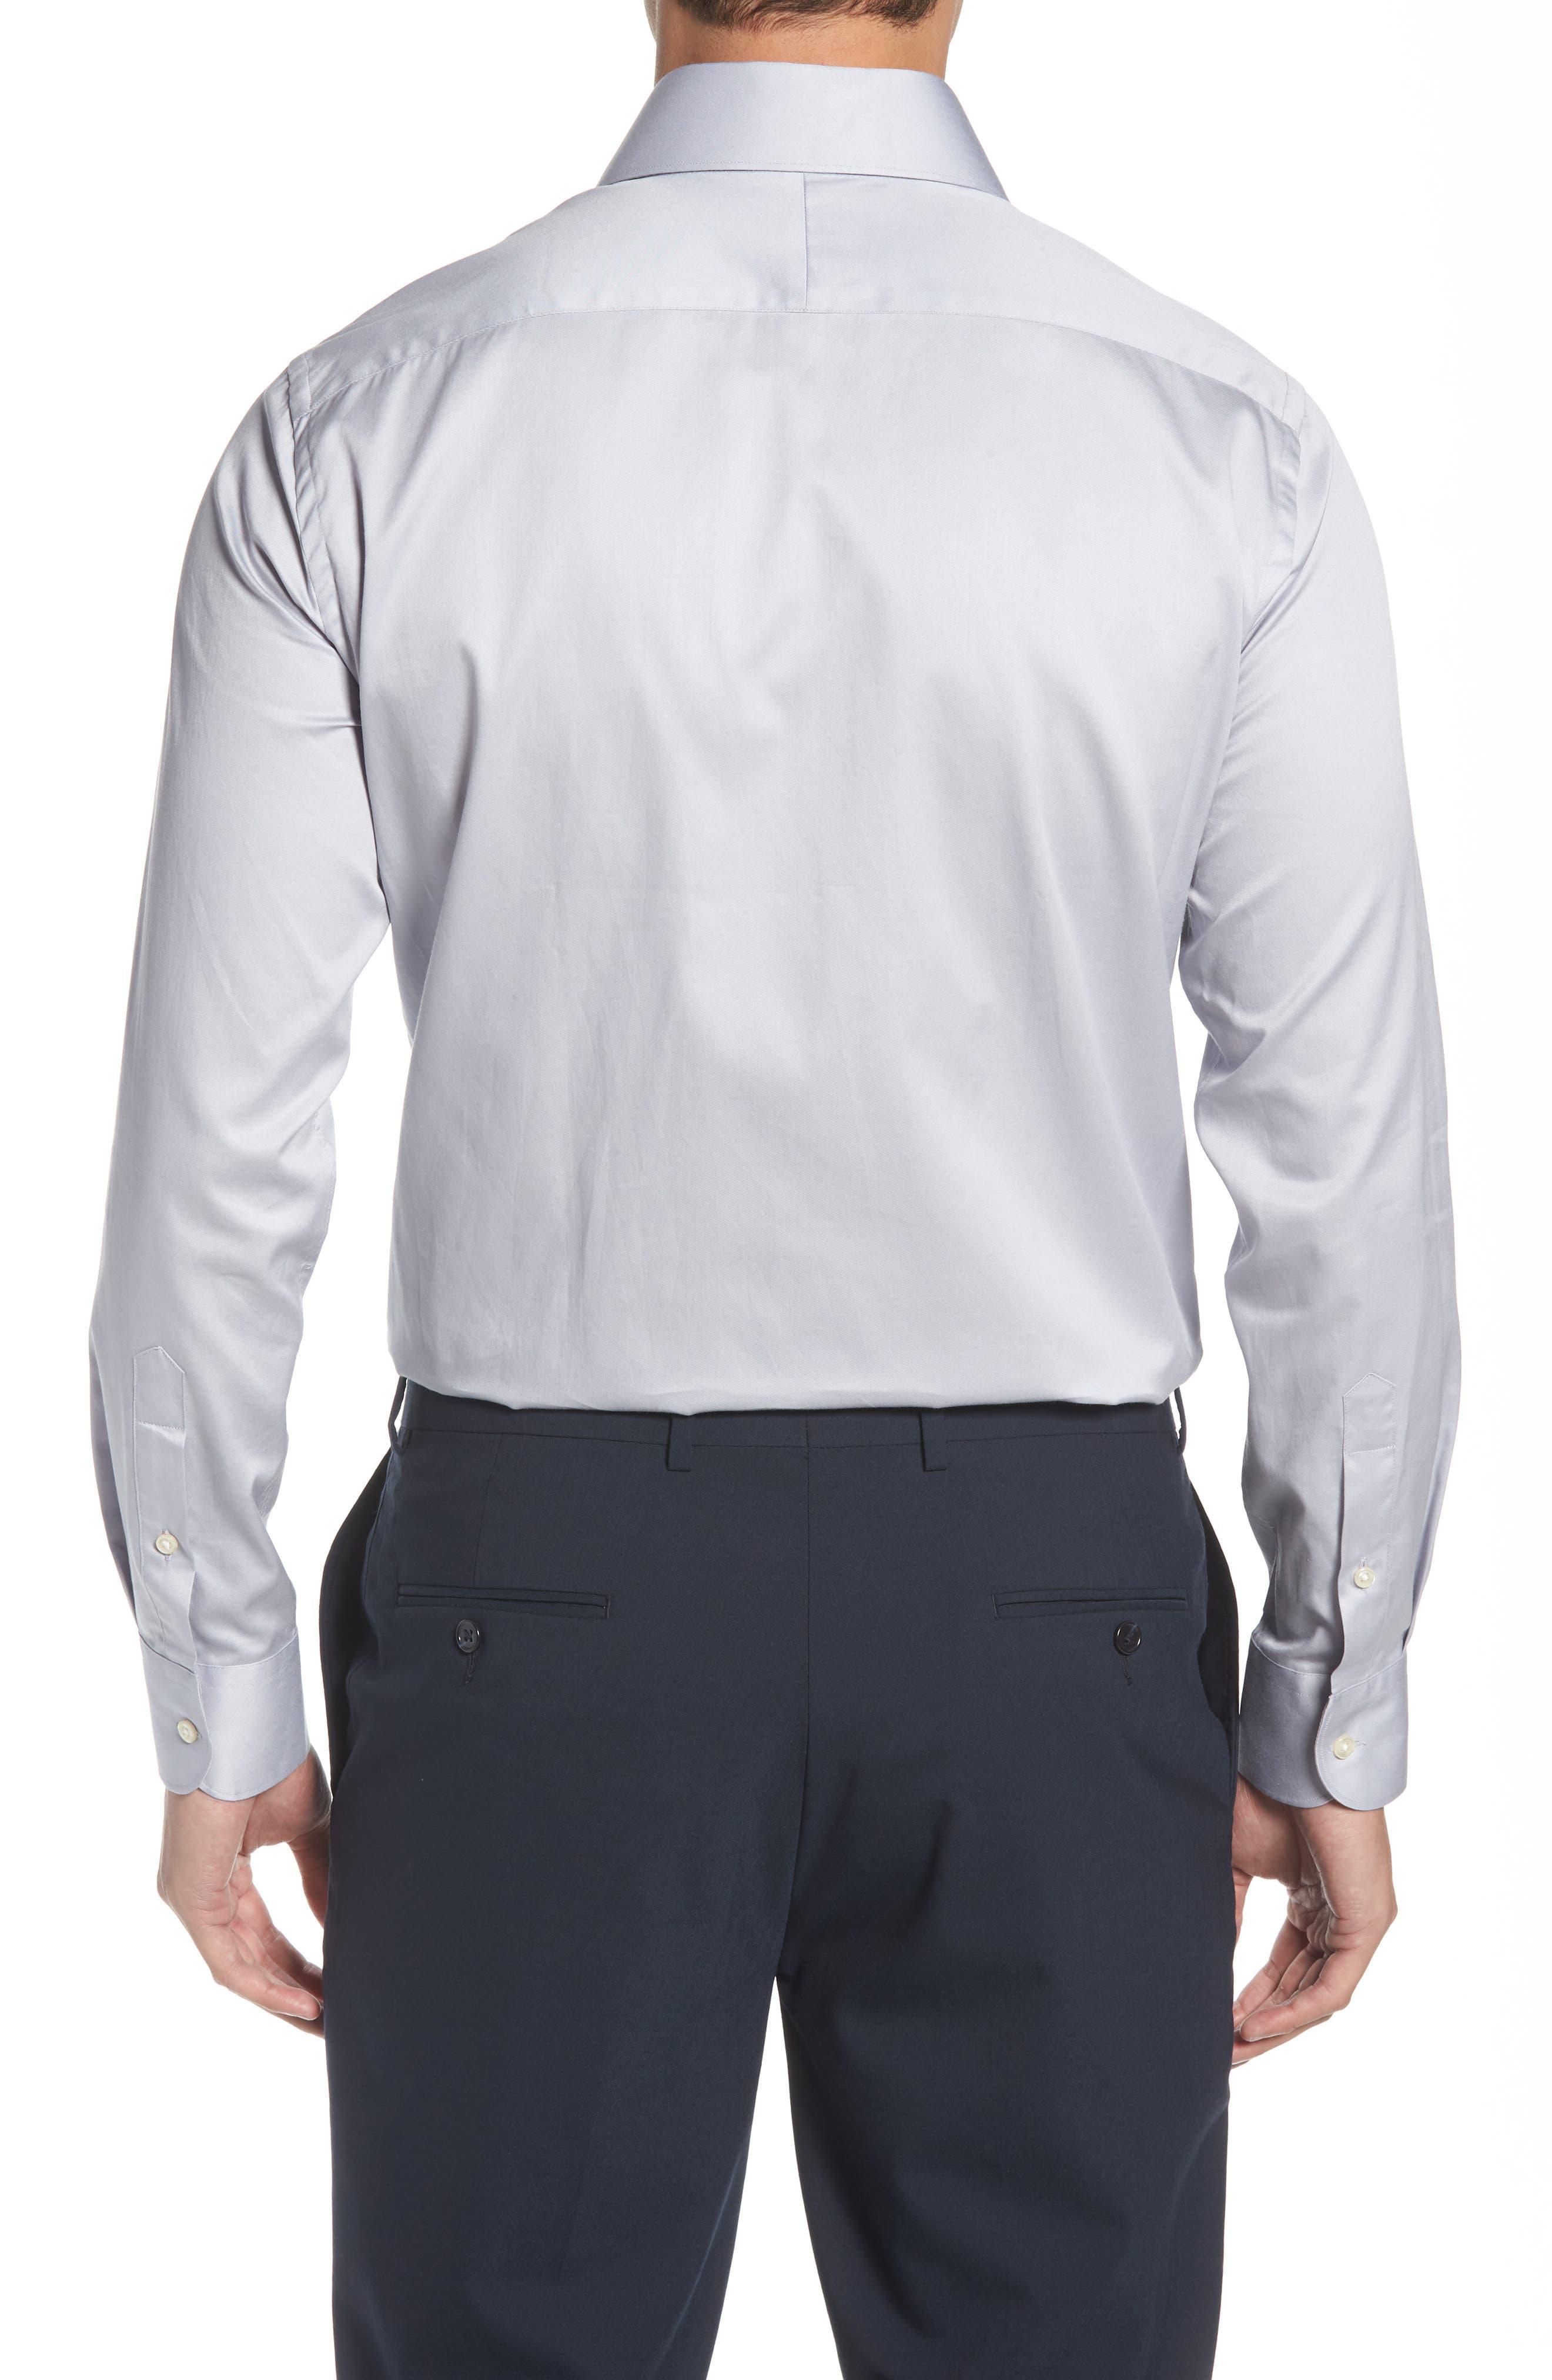 Regular Fit Solid Dress Shirt,                             Alternate thumbnail 3, color,                             020